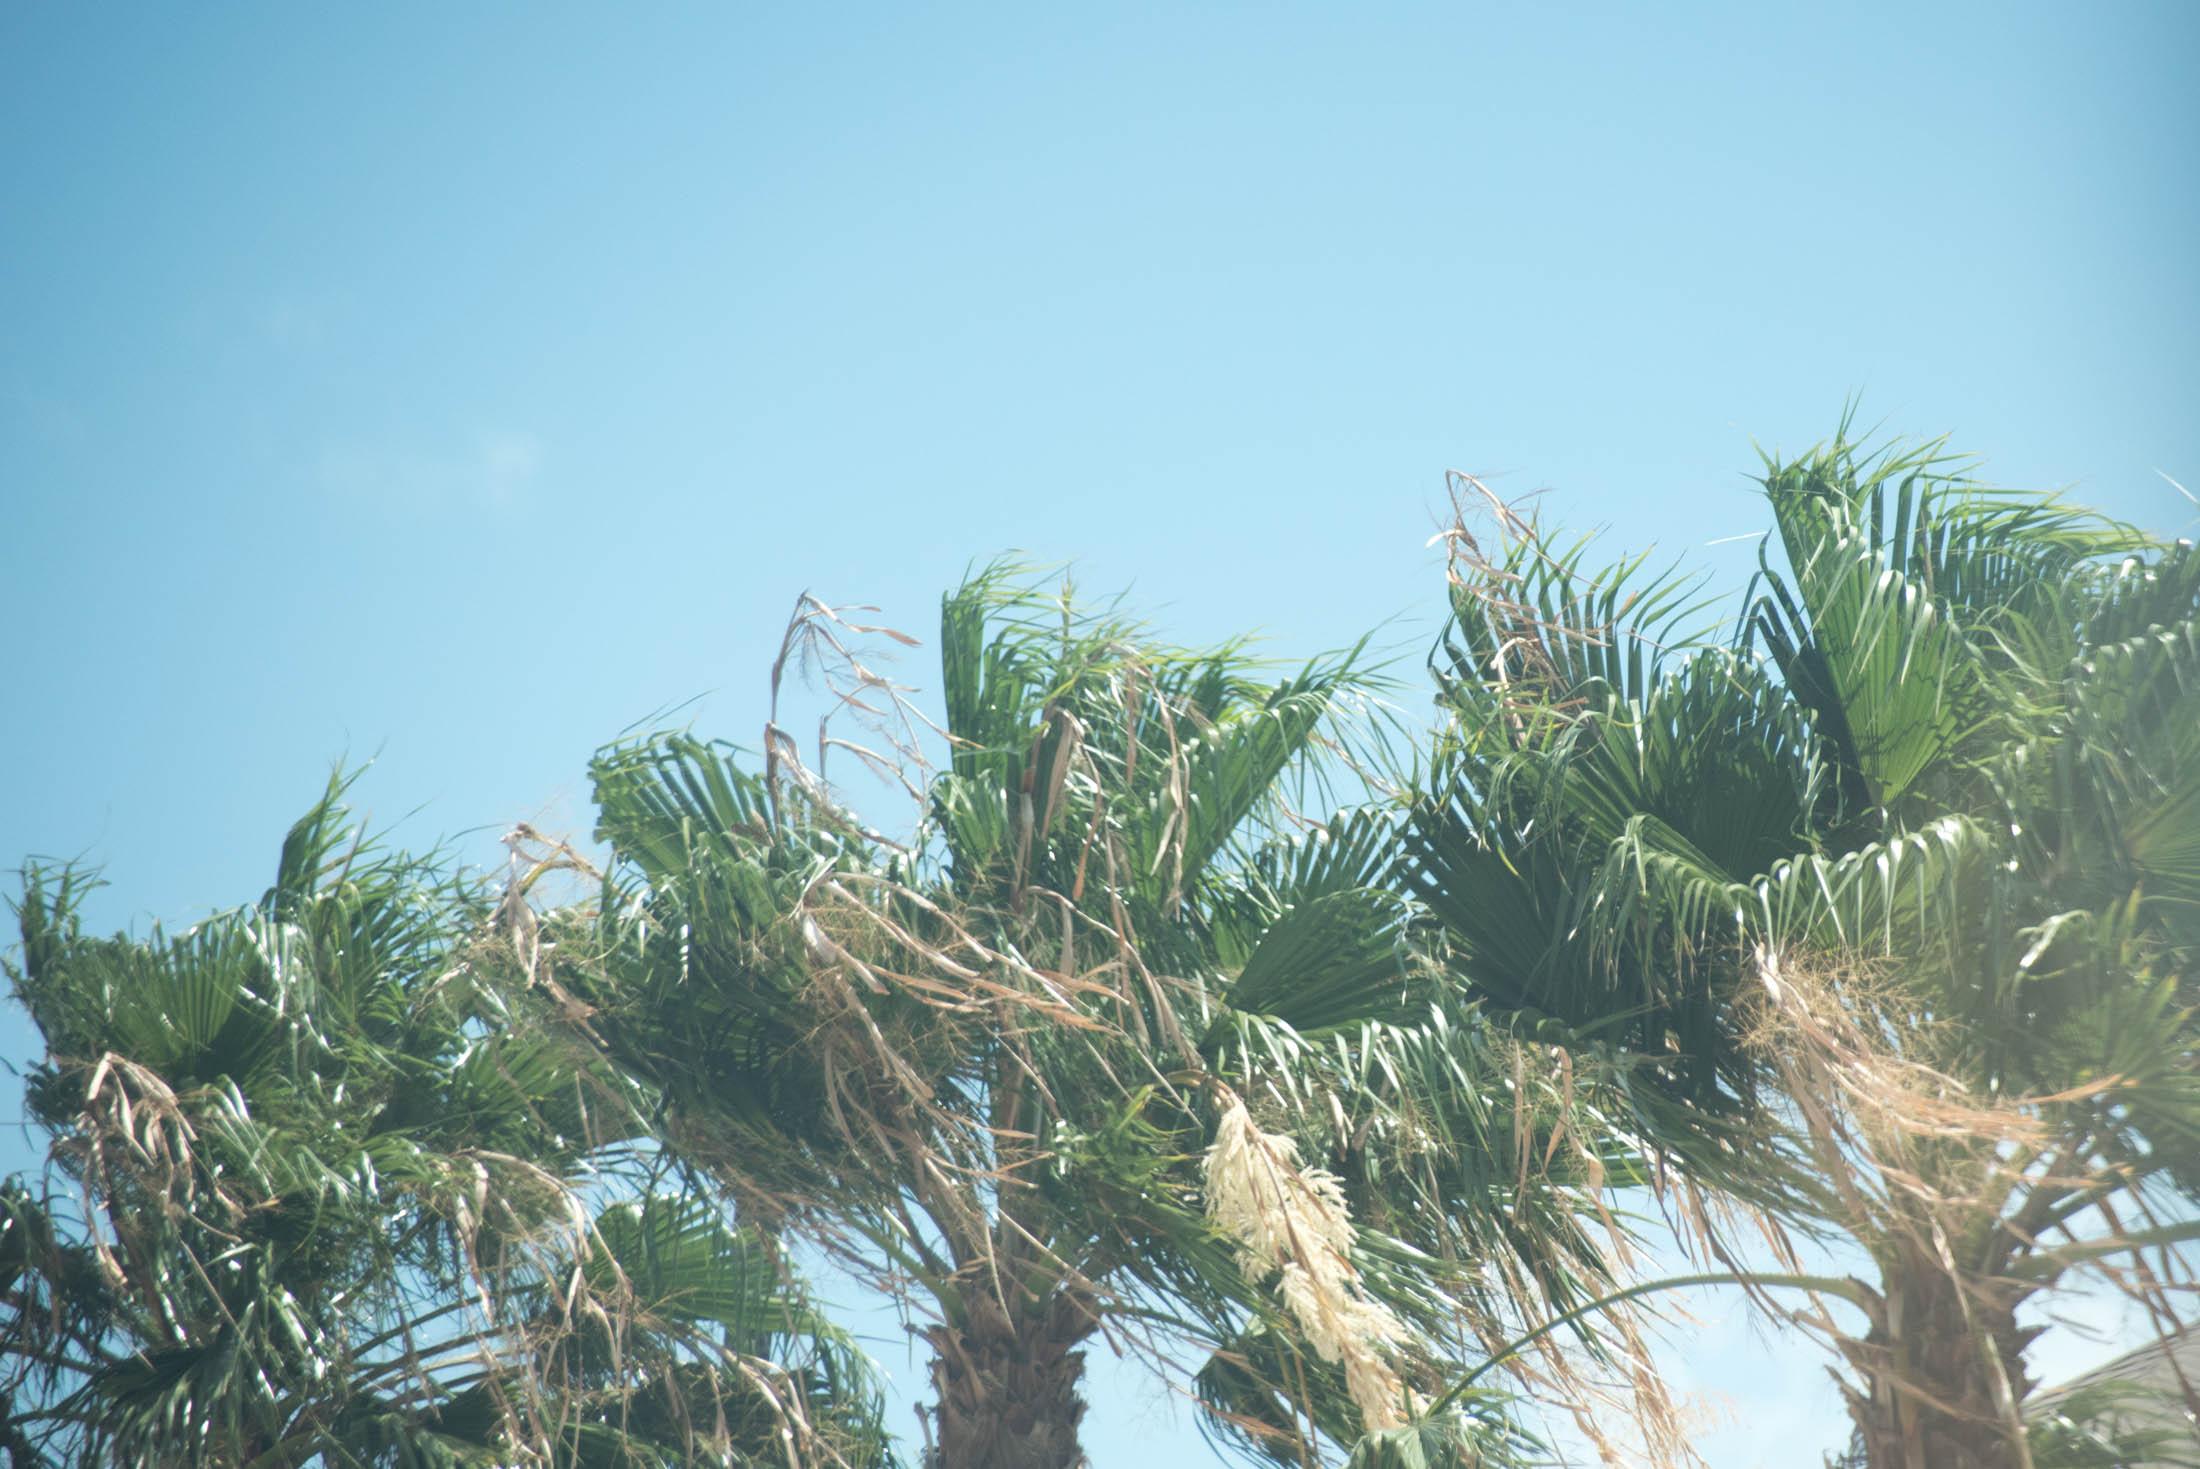 matagorda-beach-july-fourth-3